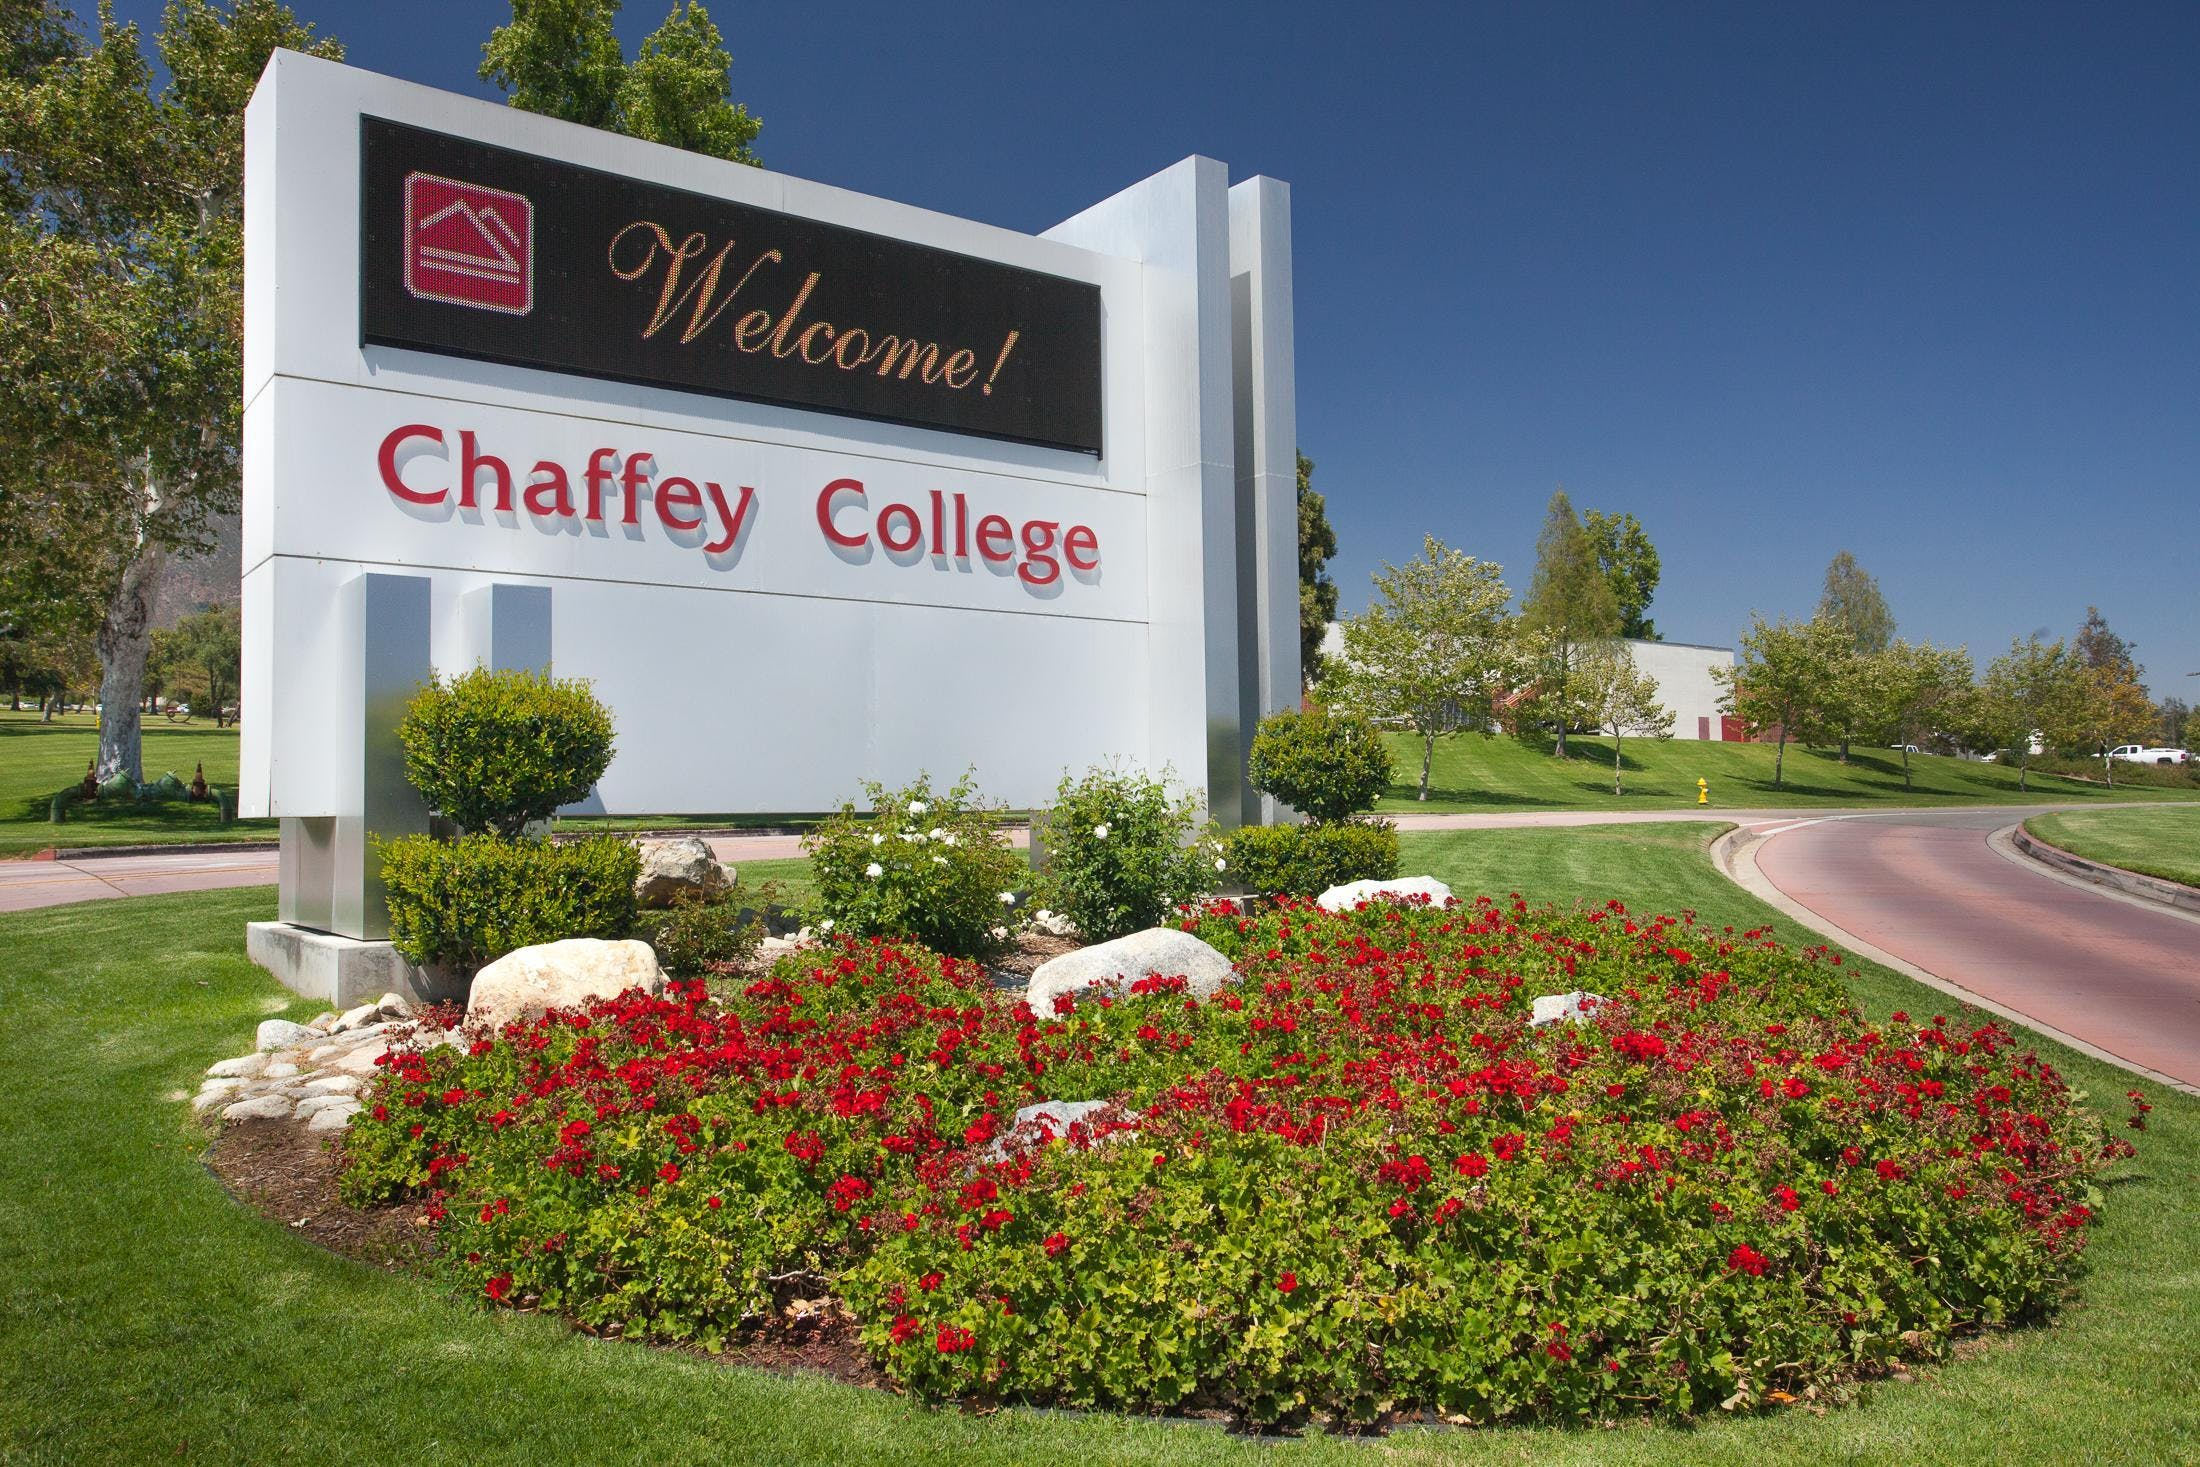 Chaffey College Spring 2019 Phlebotomy Technician Training Program